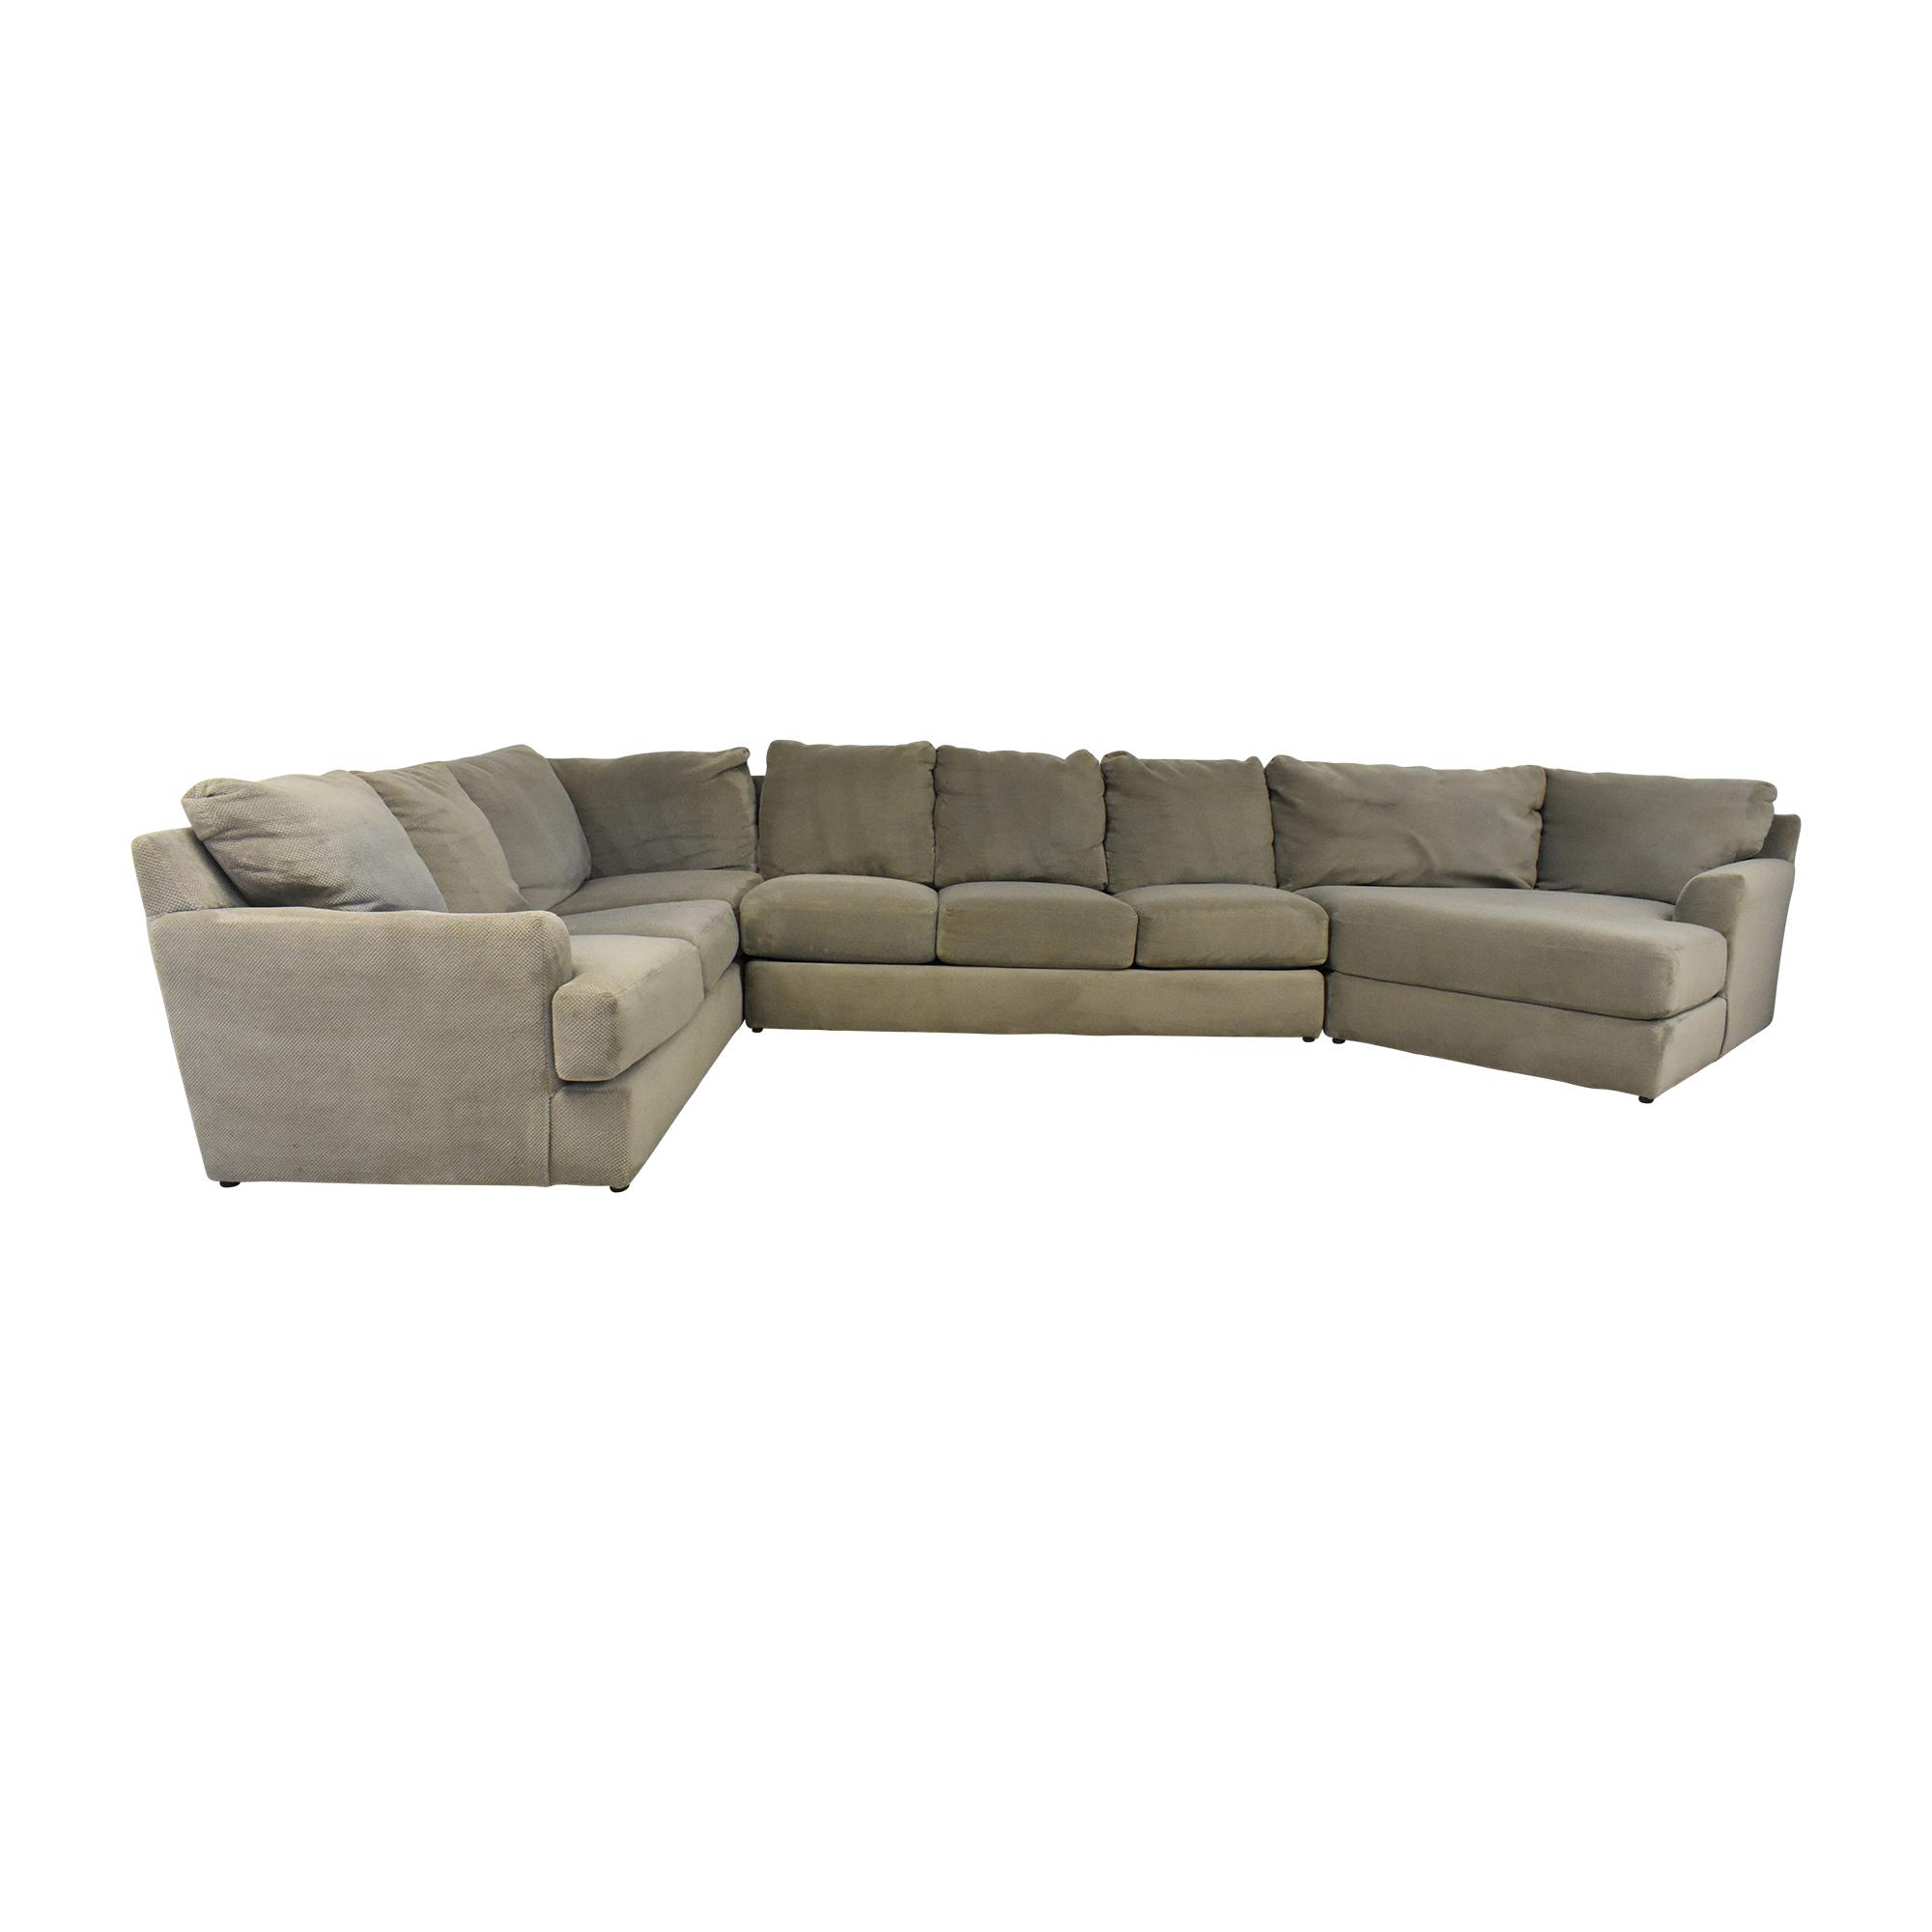 Suburban Furniture Suburban Furniture Wedge Sectional Sofa nj